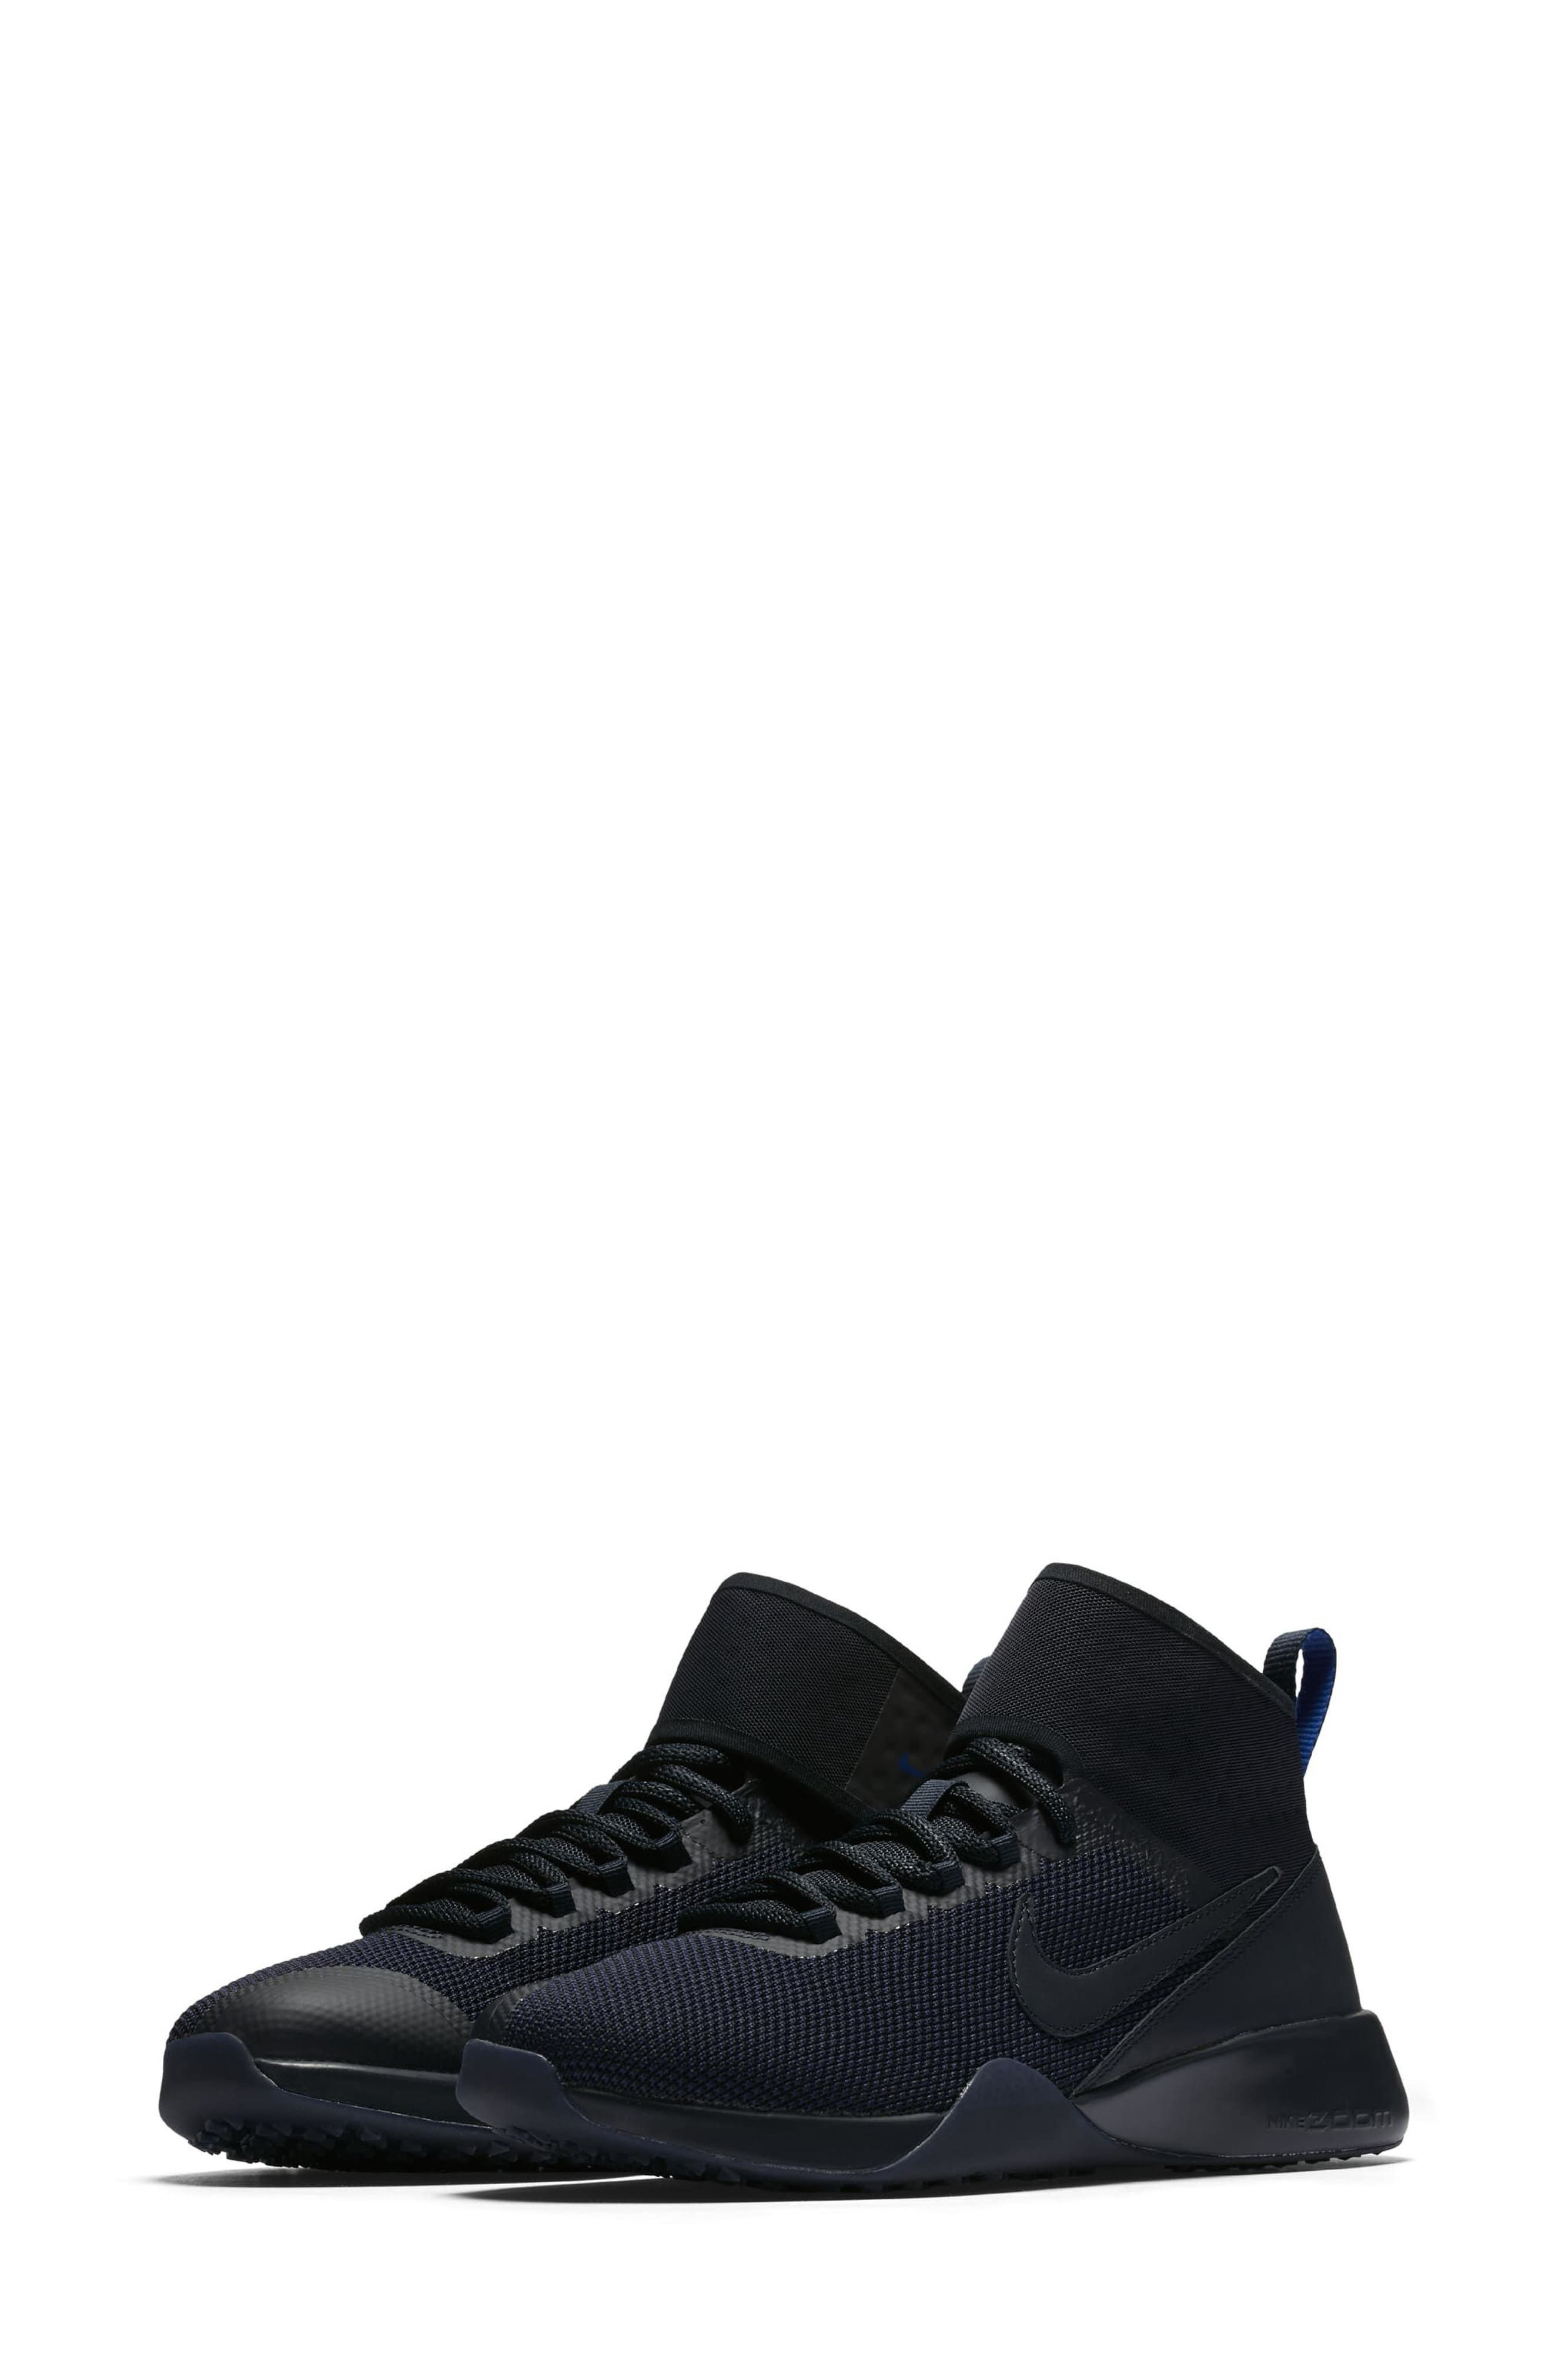 Main Image - Nike Air Zoom Strong 2 Amp Training Shoe (Women)